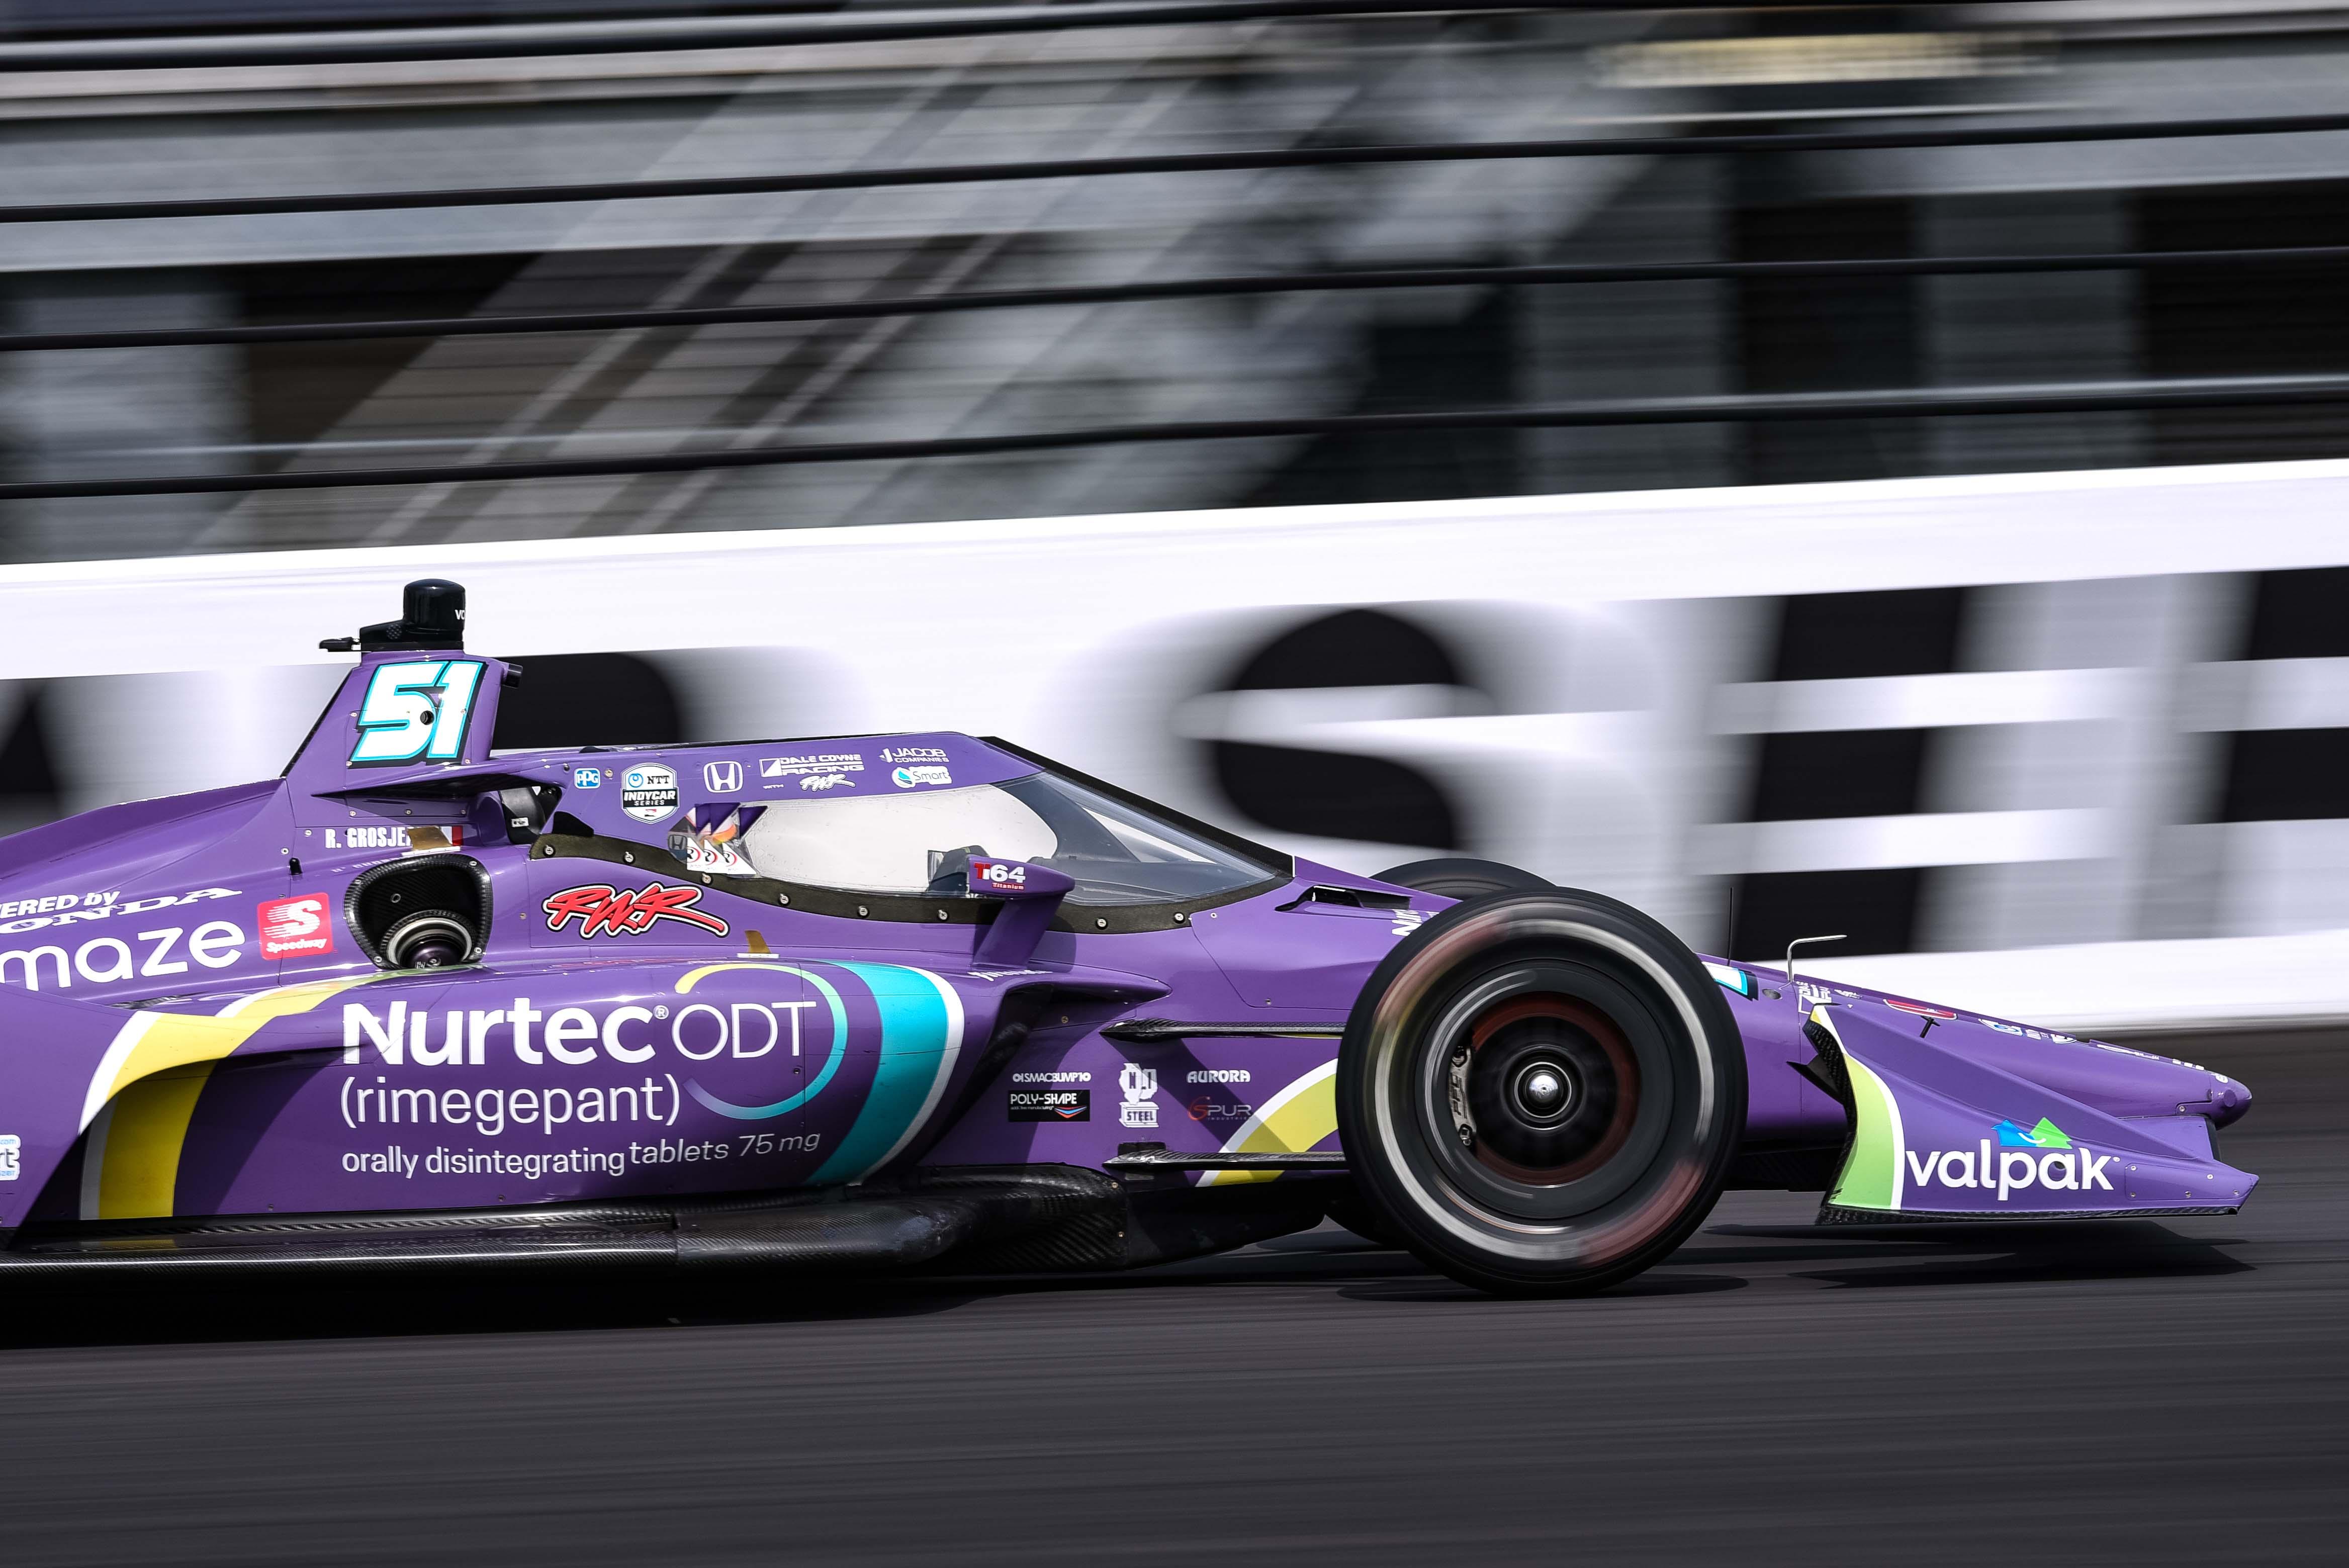 Romain Grosjean 51 - GMR Grand Prix - Indianapolis Motor Speedway - Indycar Series